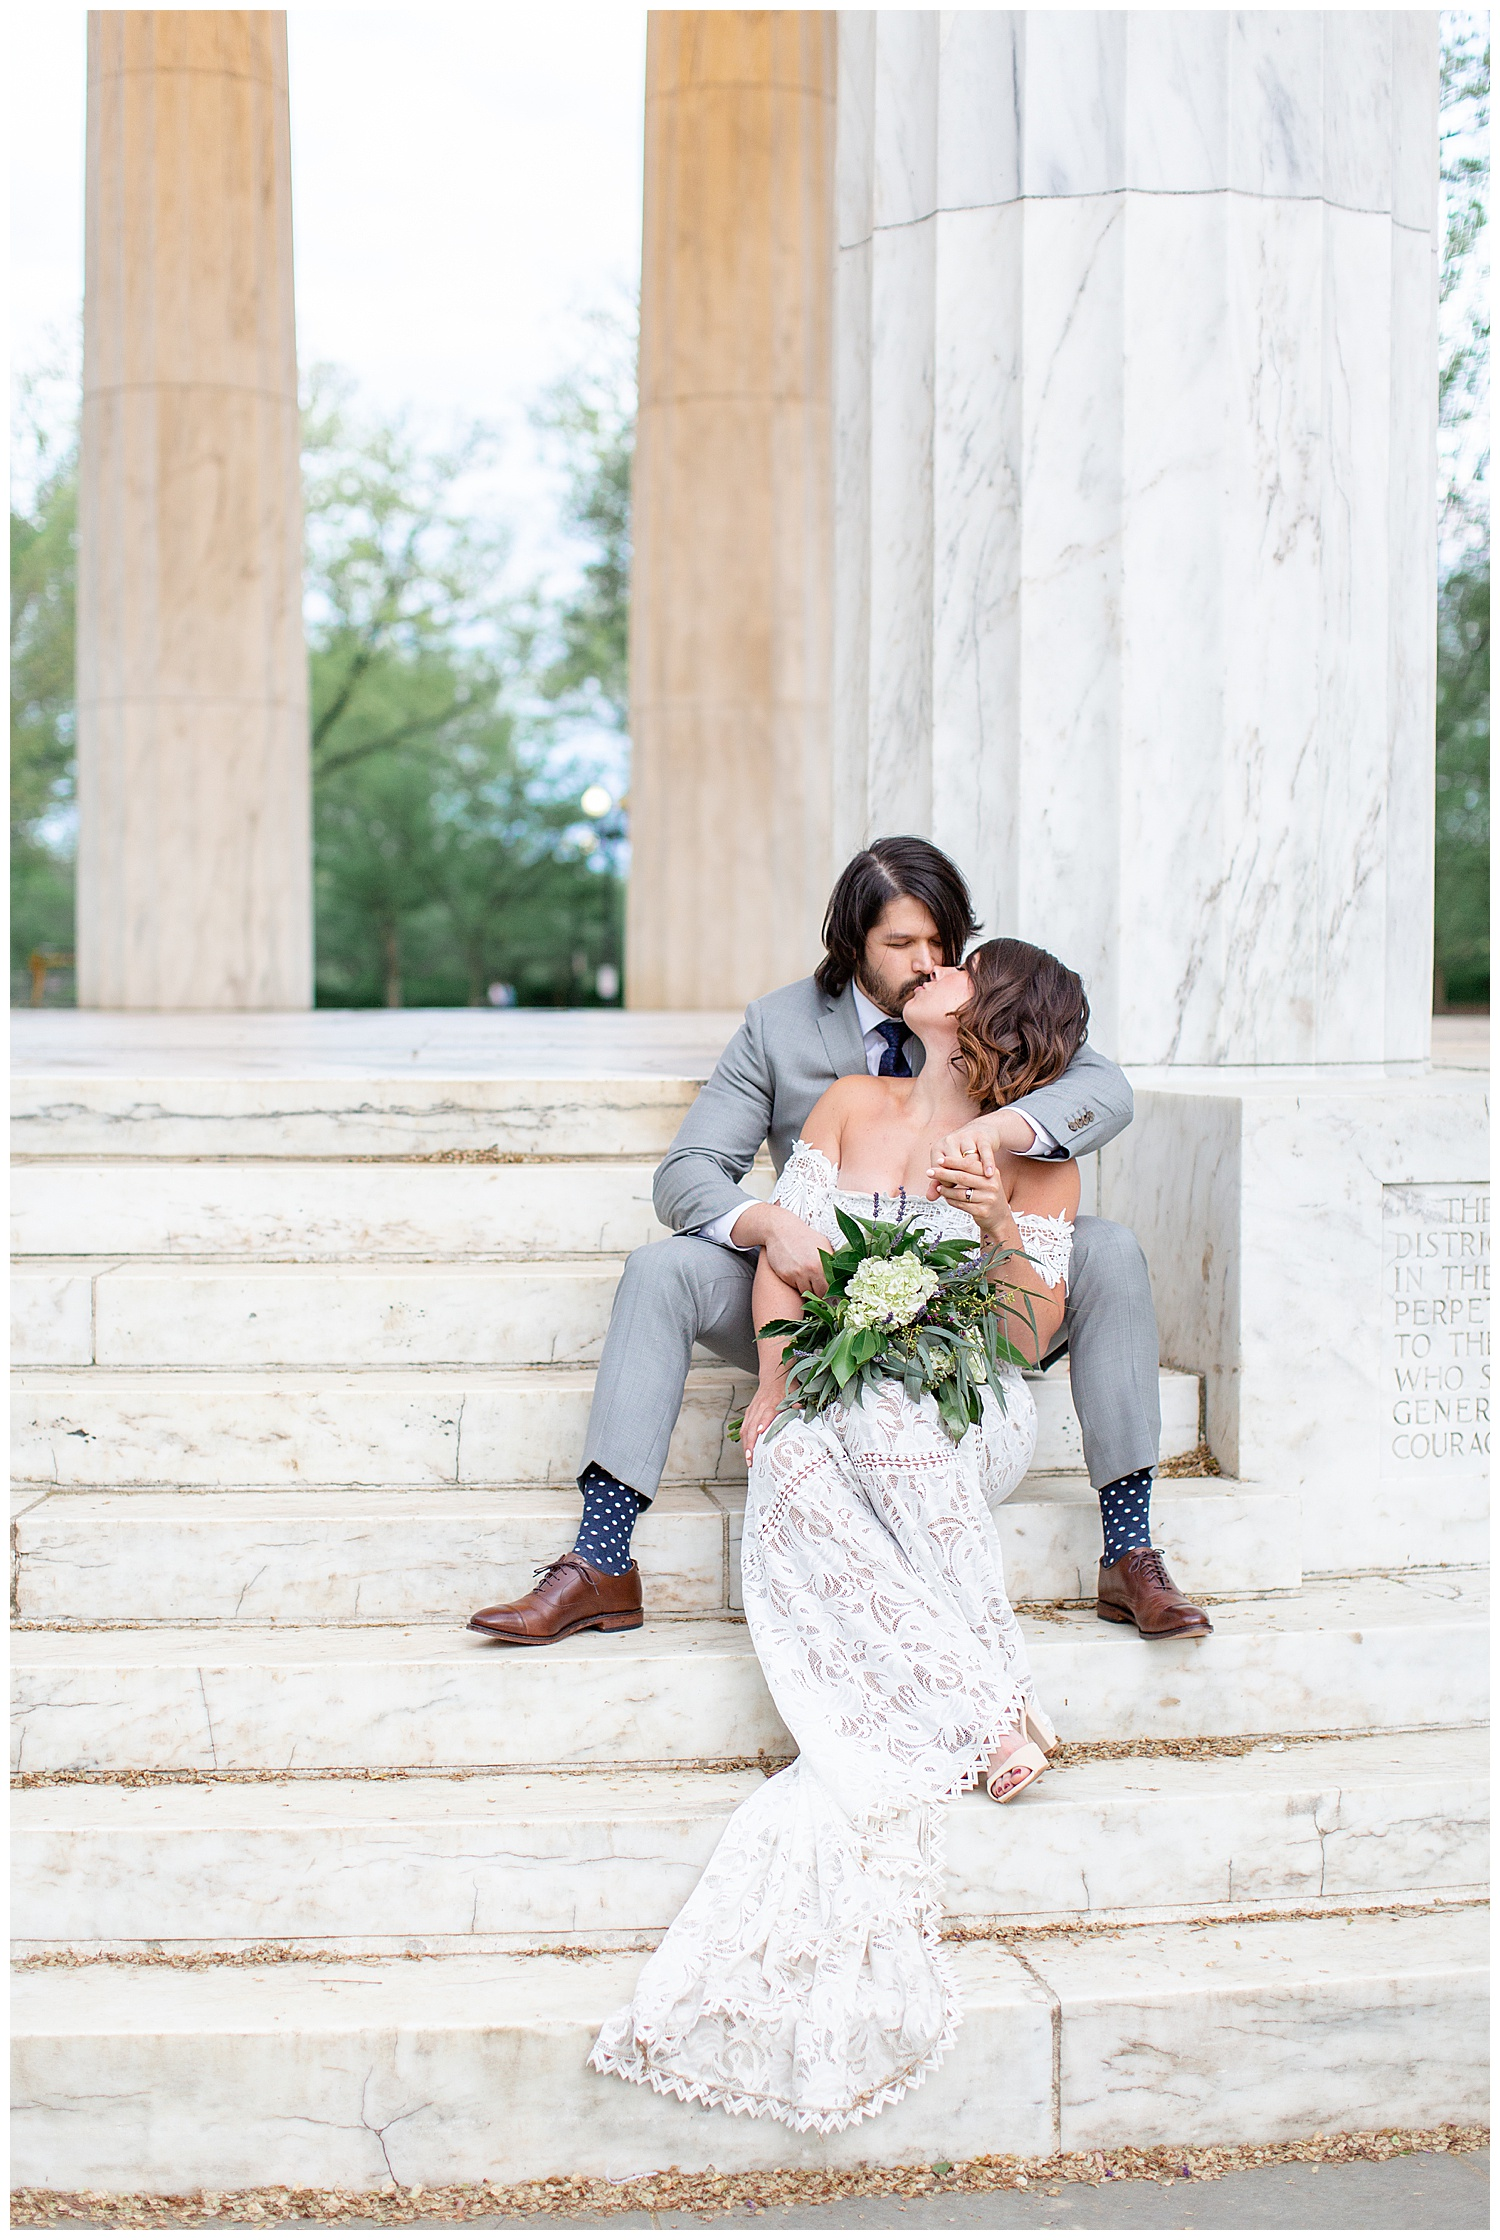 emily-belson-photography-washington-dc-wedding-32.jpg